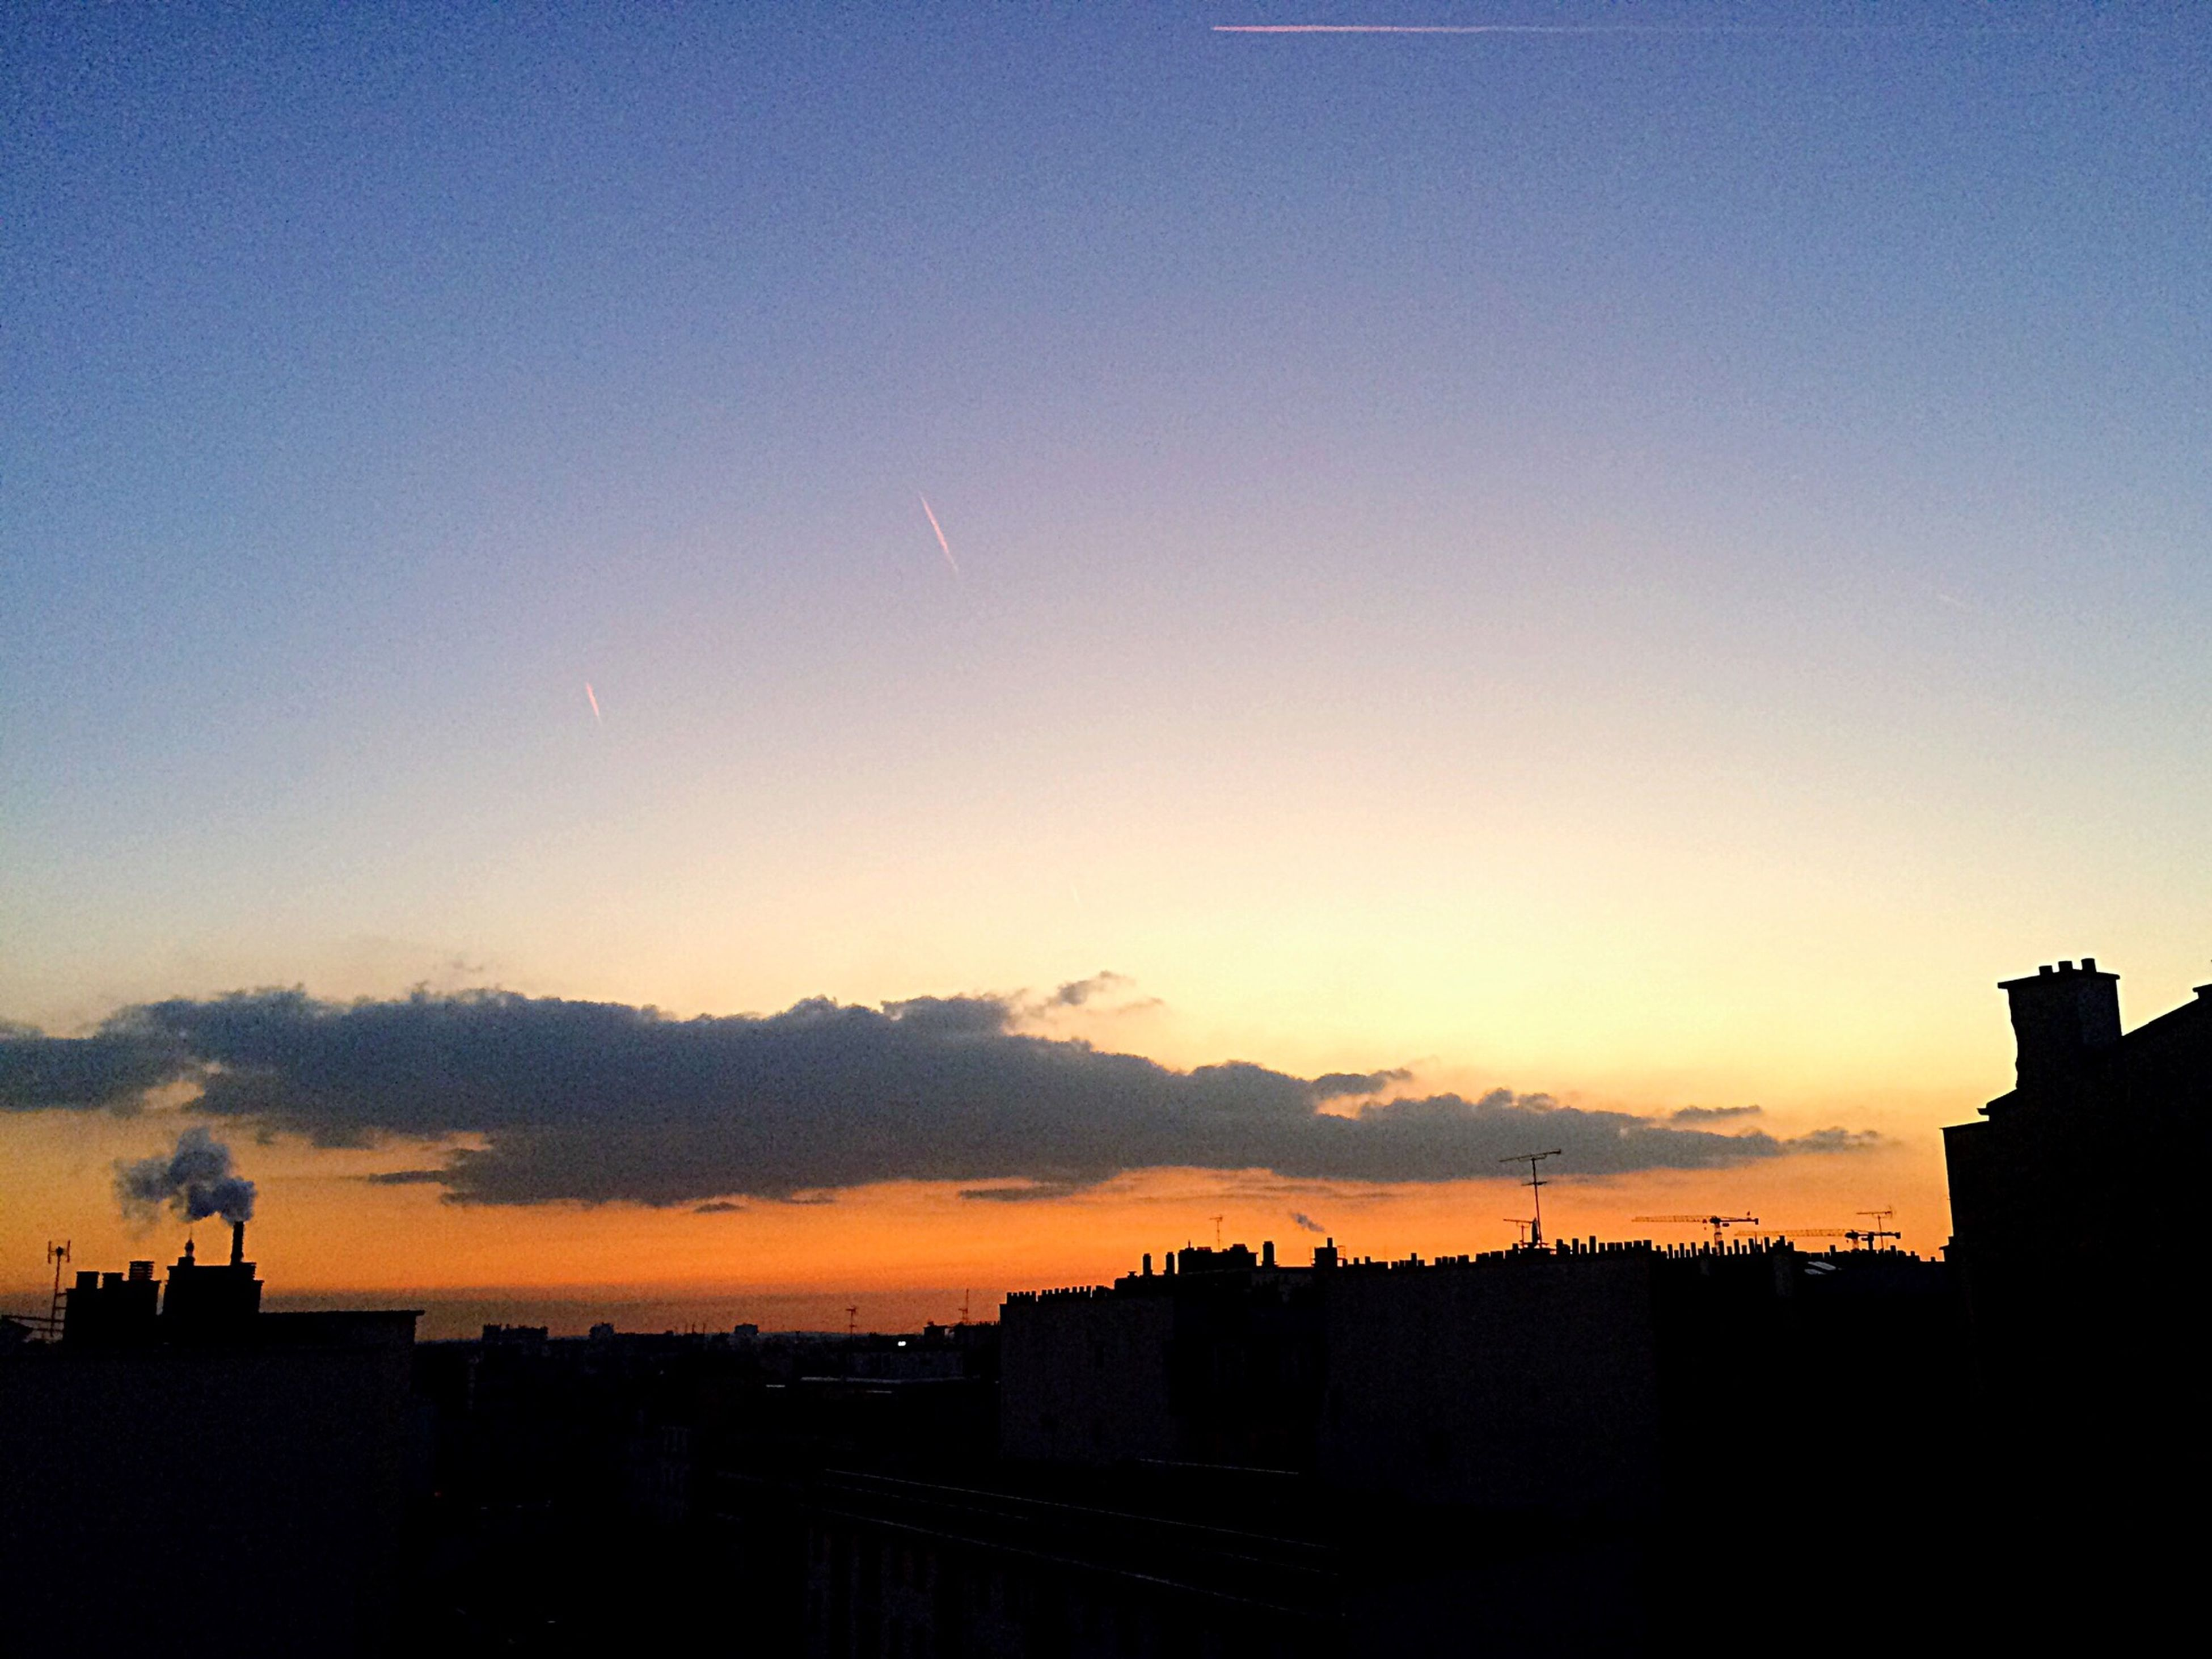 sunset, building exterior, silhouette, architecture, built structure, city, copy space, sky, orange color, cityscape, residential structure, residential building, blue, dusk, building, scenics, house, beauty in nature, outdoors, nature